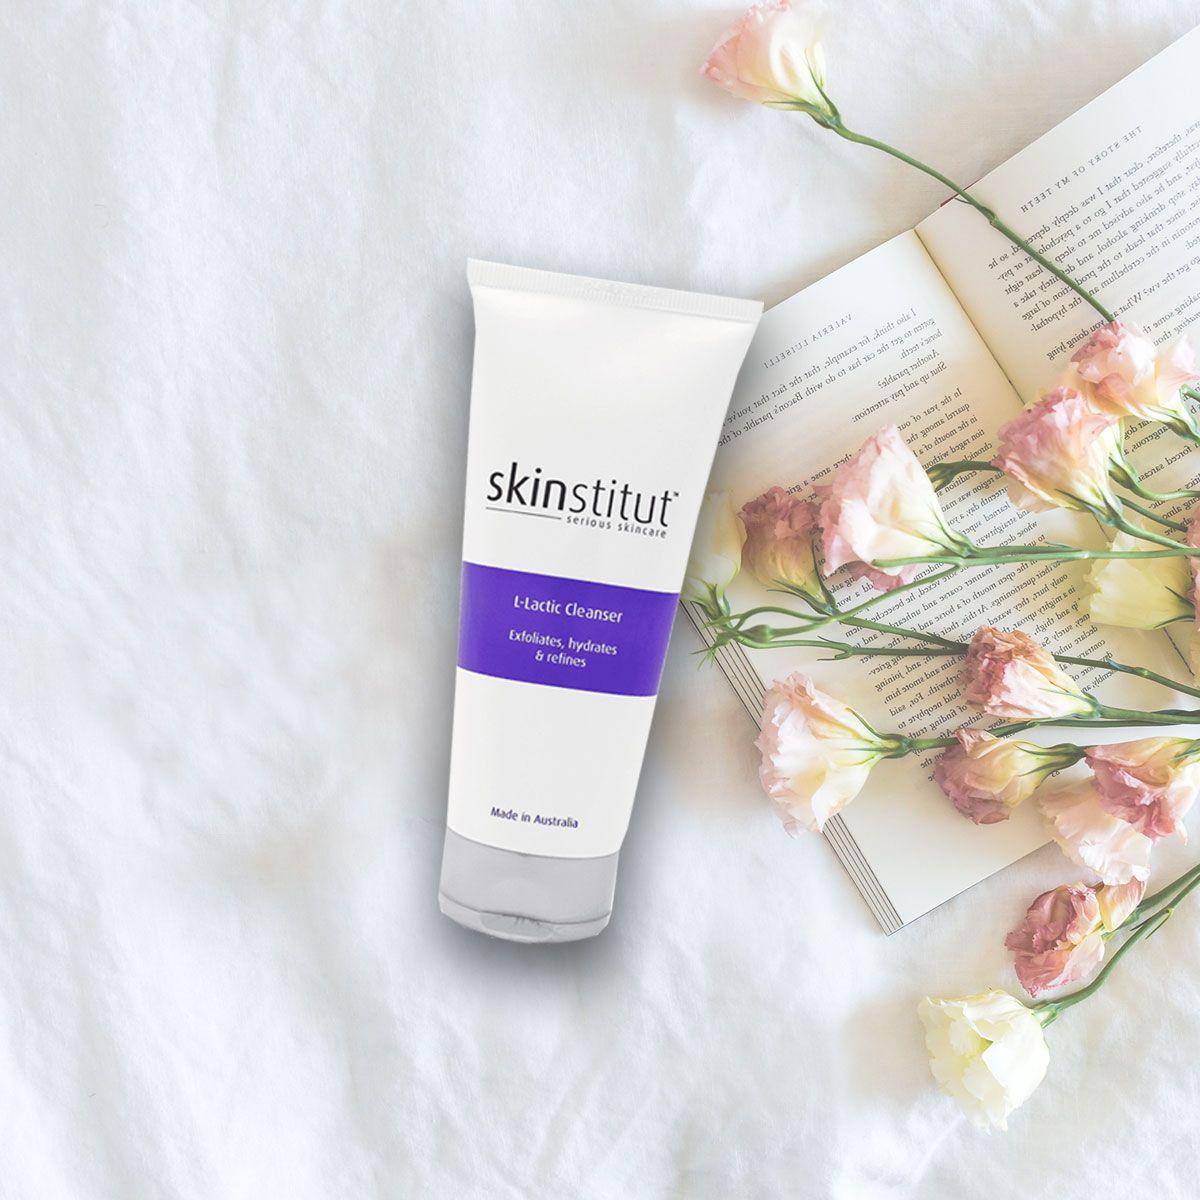 Buy 3 Skinstitut products & receive a FREE 50ml Skinstitut